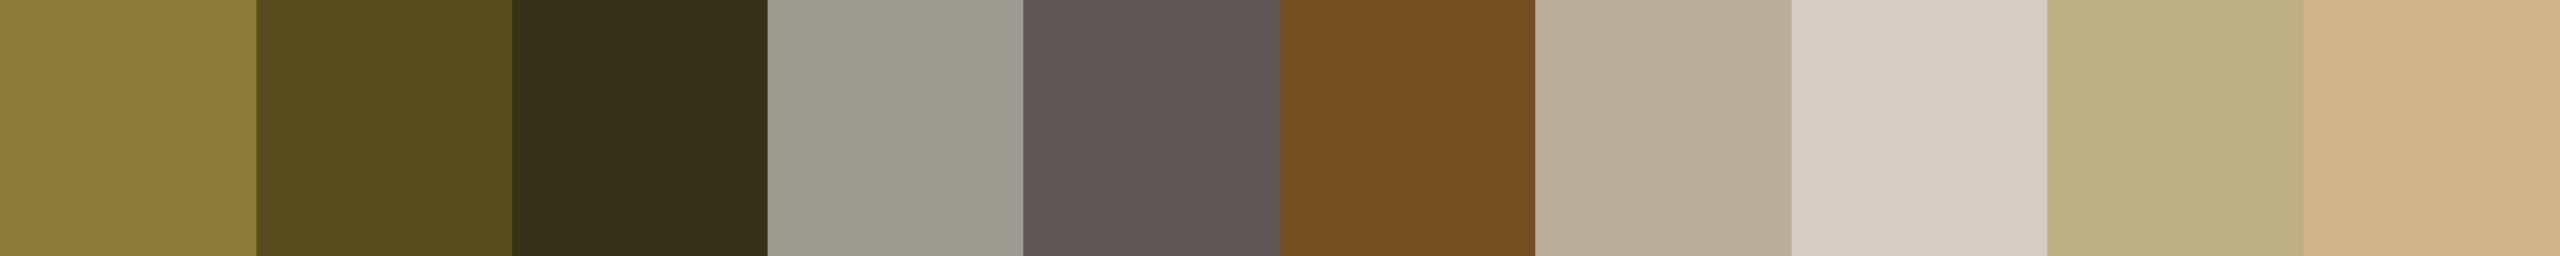 694 Zoistera Color Palette